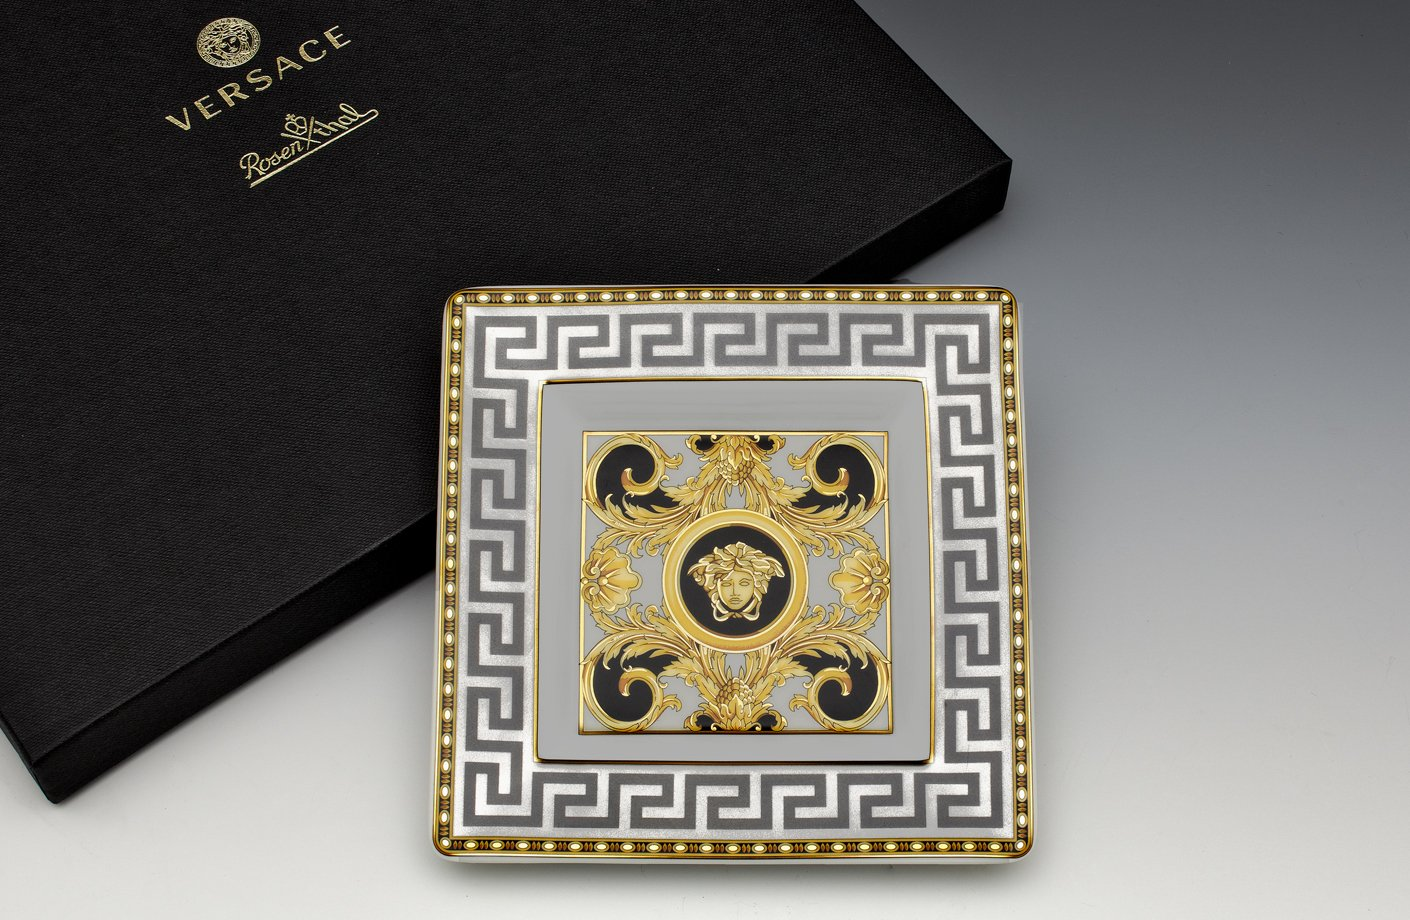 Prestige Gala Dish Square 14 Cm Versace Home Australia